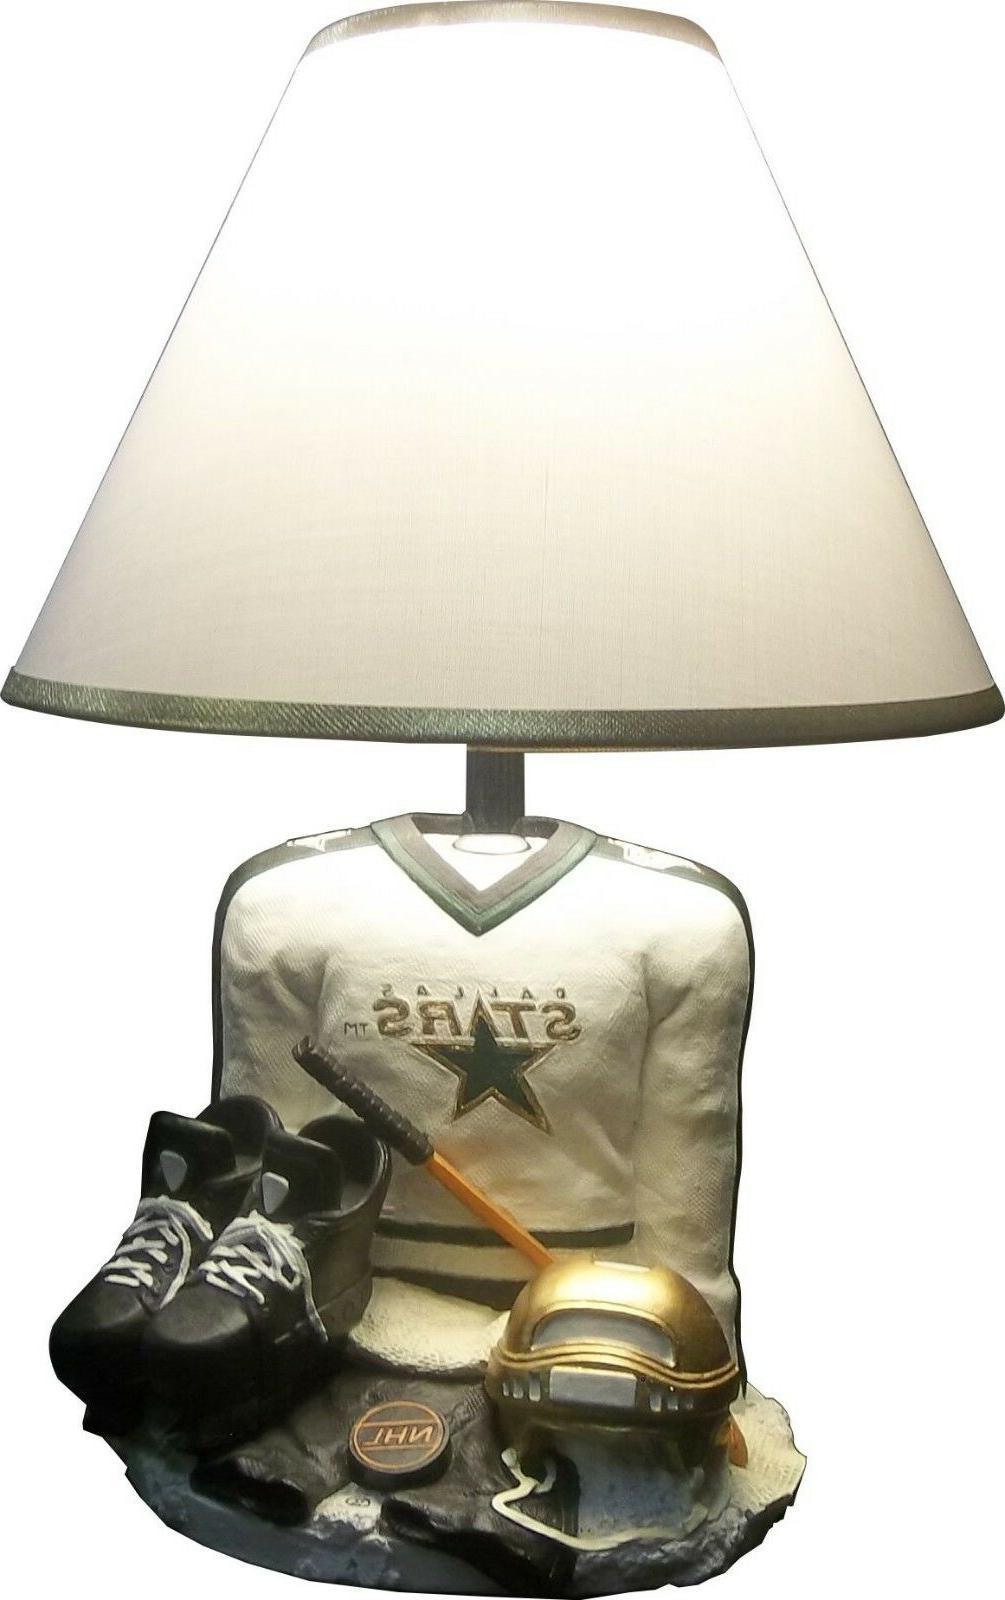 DALLAS NHL DESK LAMP BASE